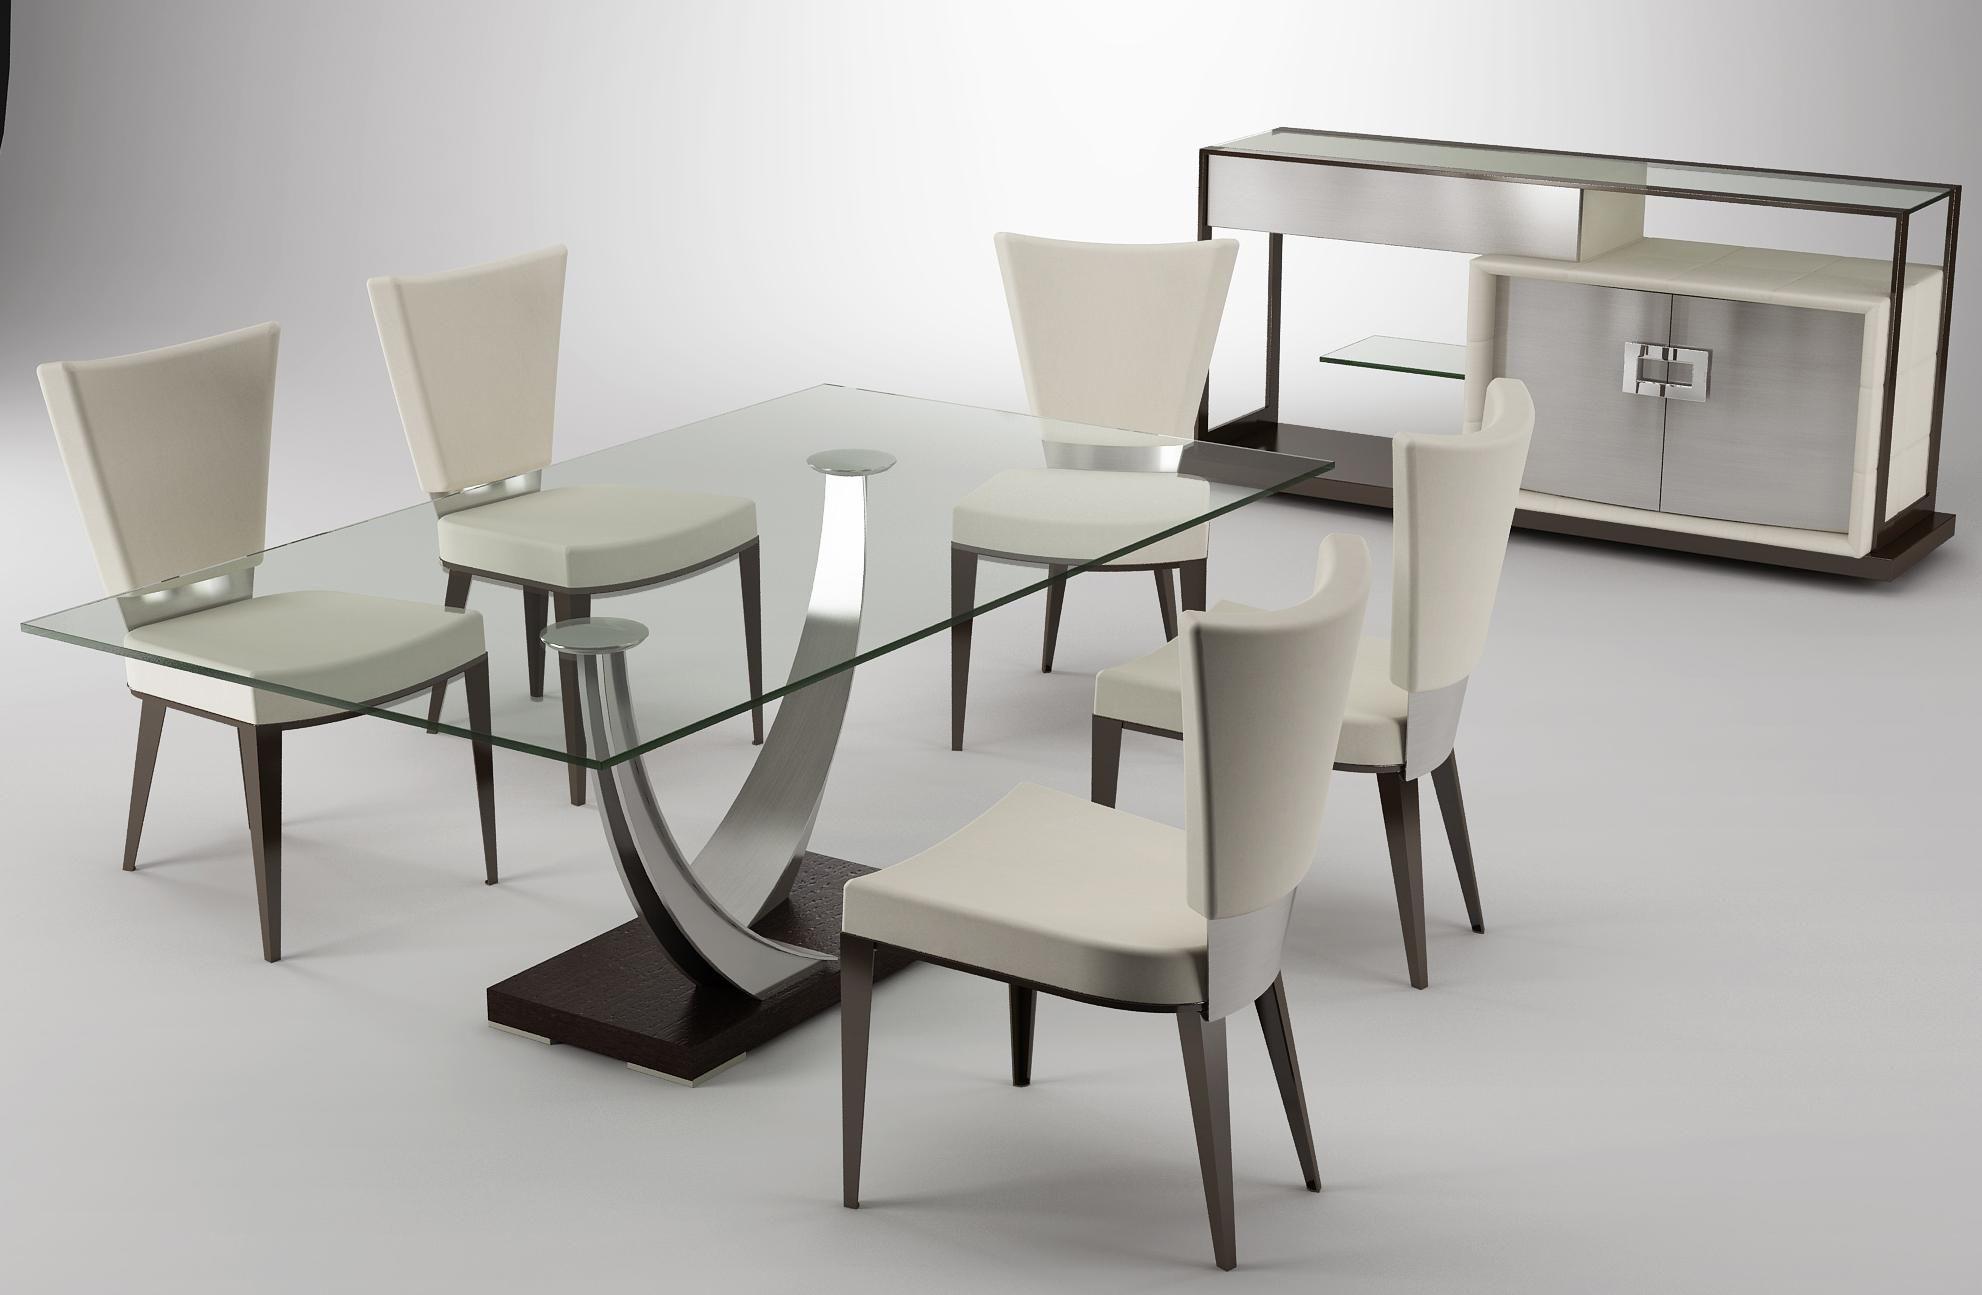 Modern Dining 6 Piece Table Modern Glass Dining Room Modern Dining Room Tables Dining Room Decor Modern